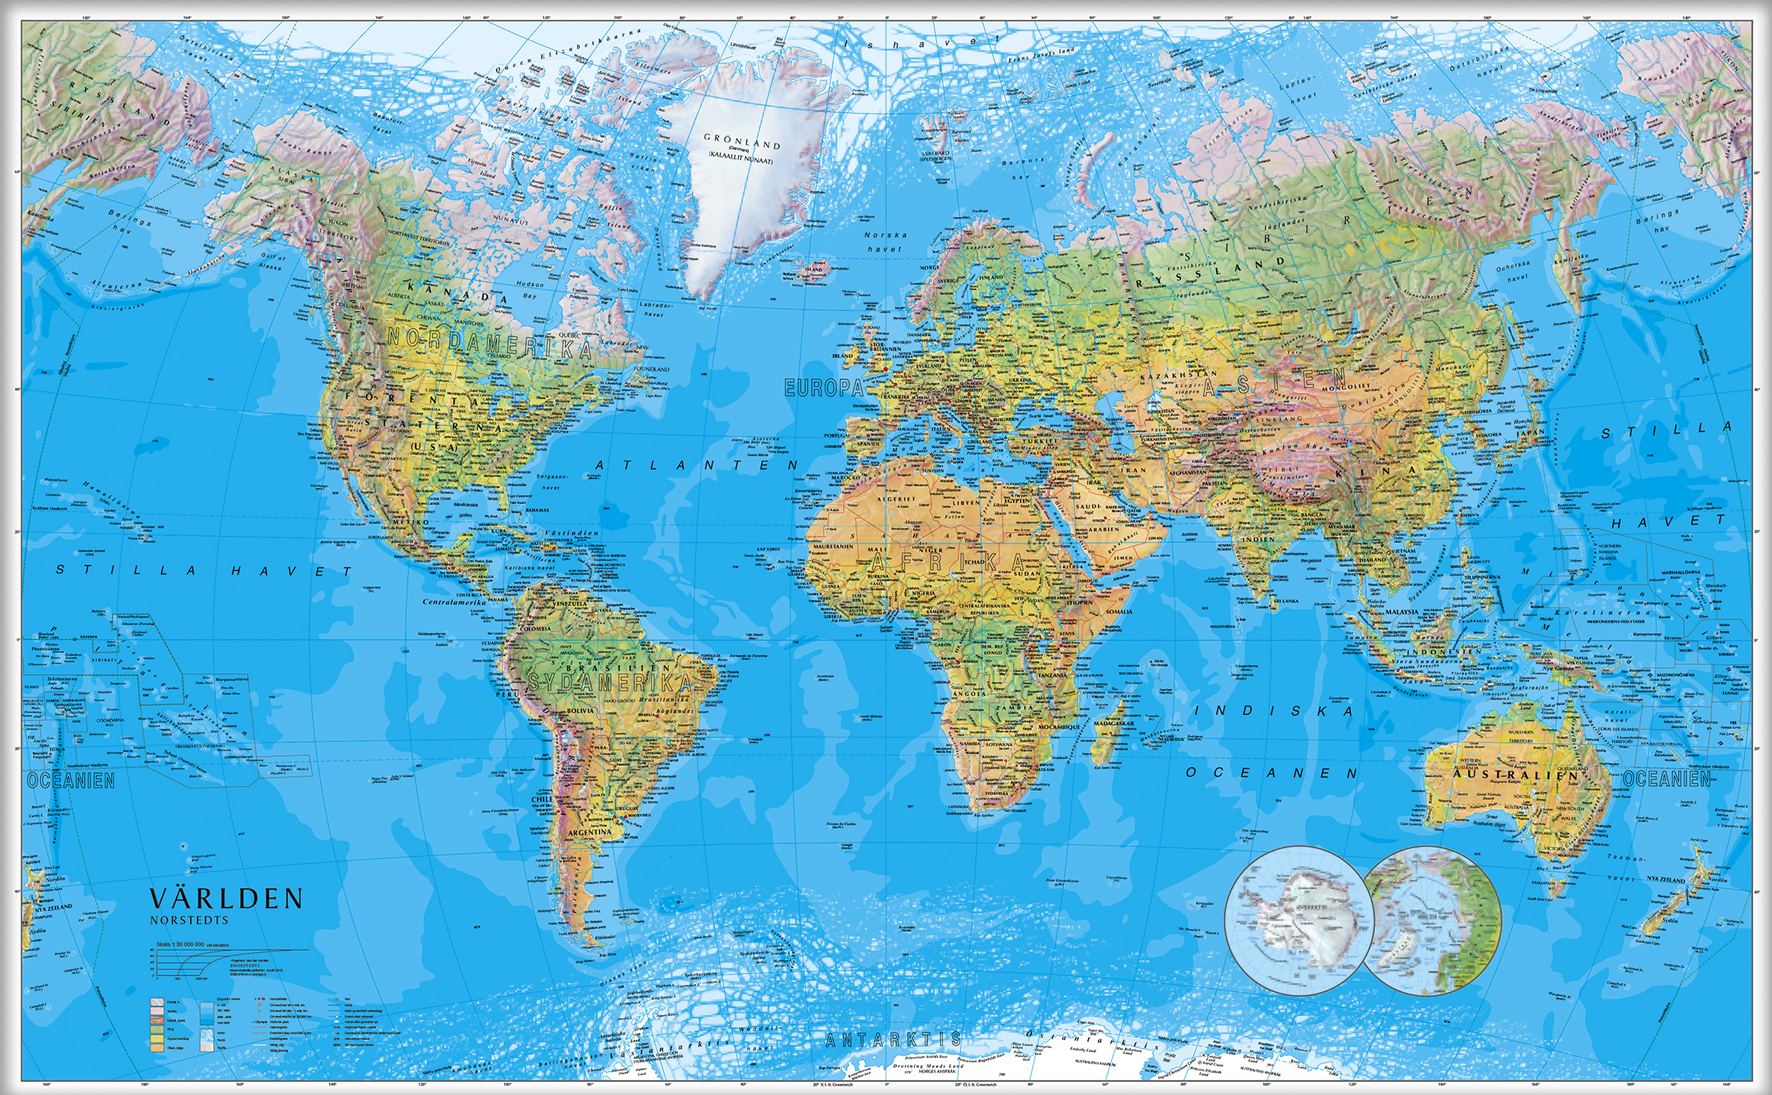 Karta Over Varldens Bergskedjor.Varldskarta 1 30milj 137x85cm Contalia Kontorsvaror